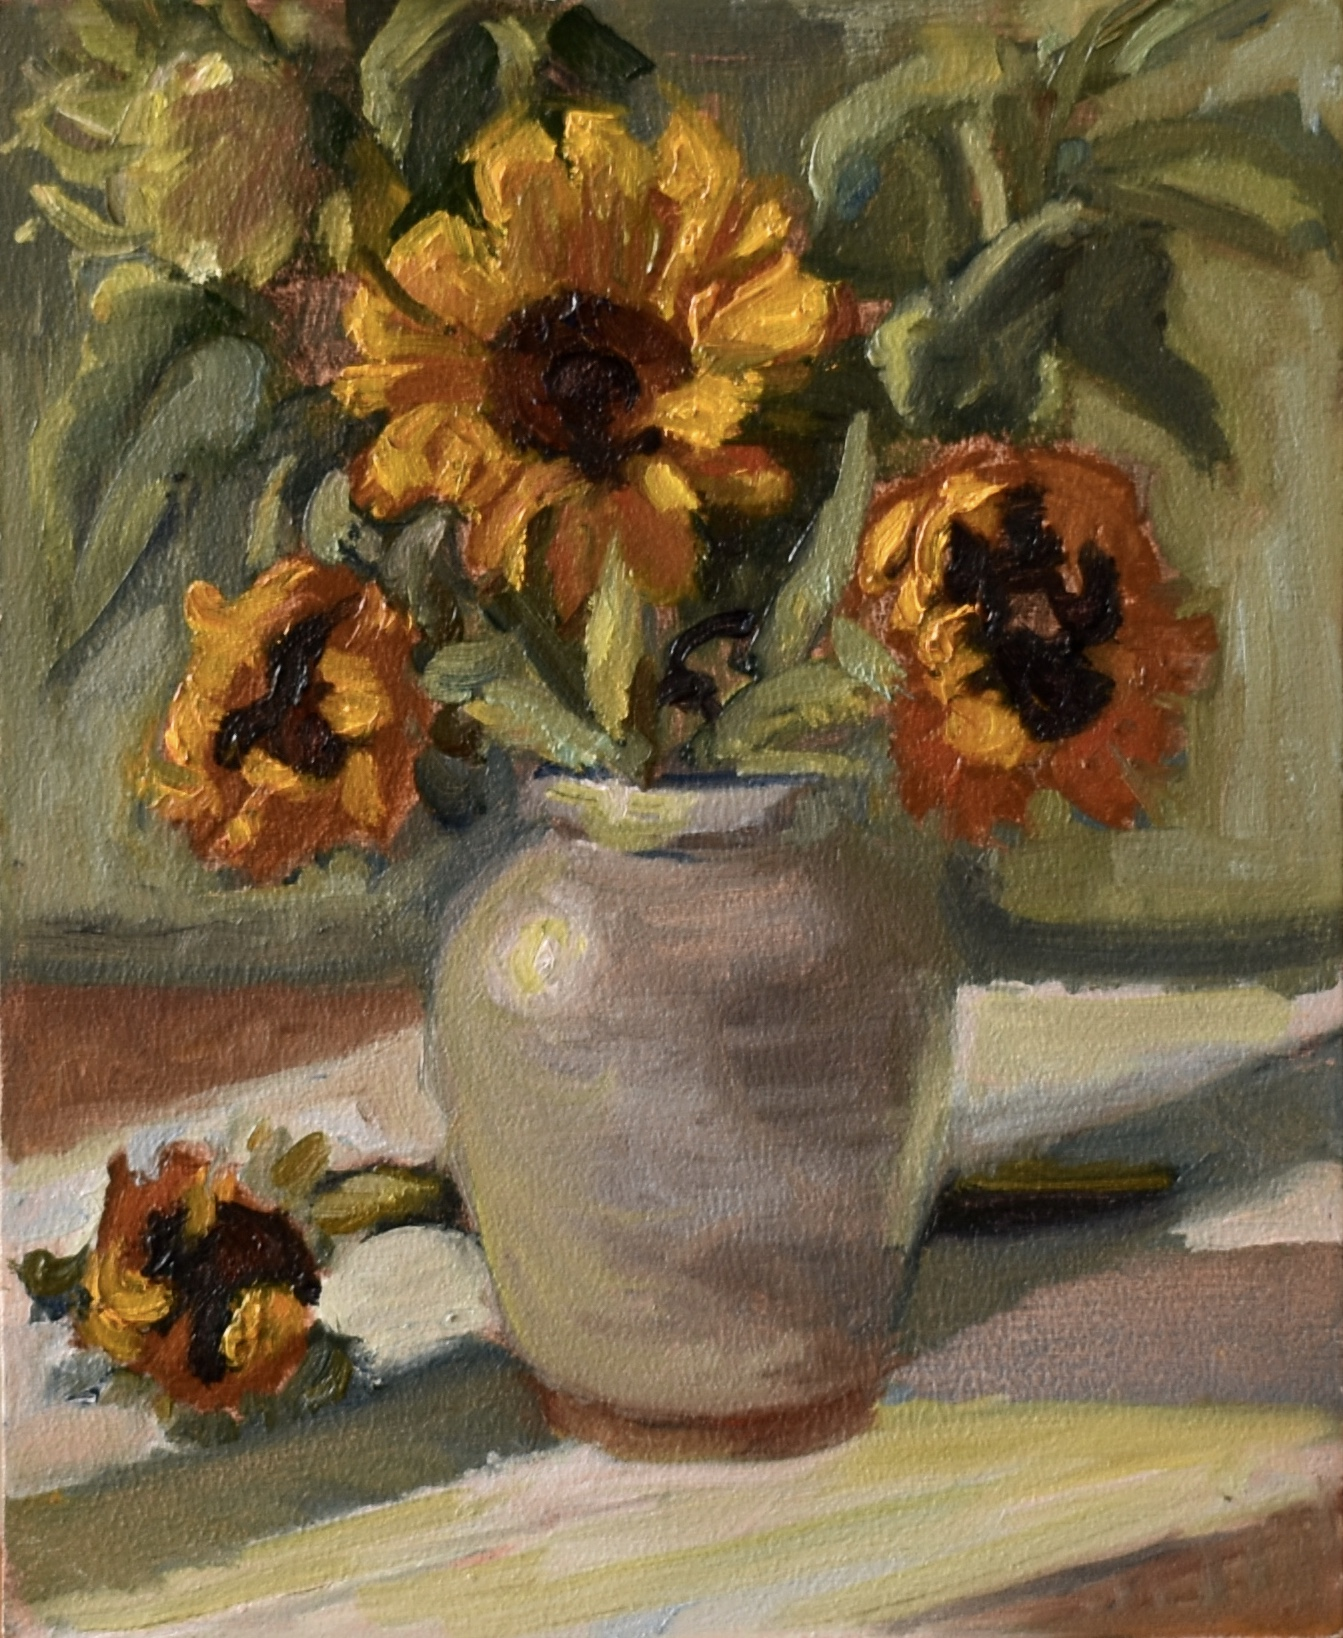 Trio of Sunflowers.